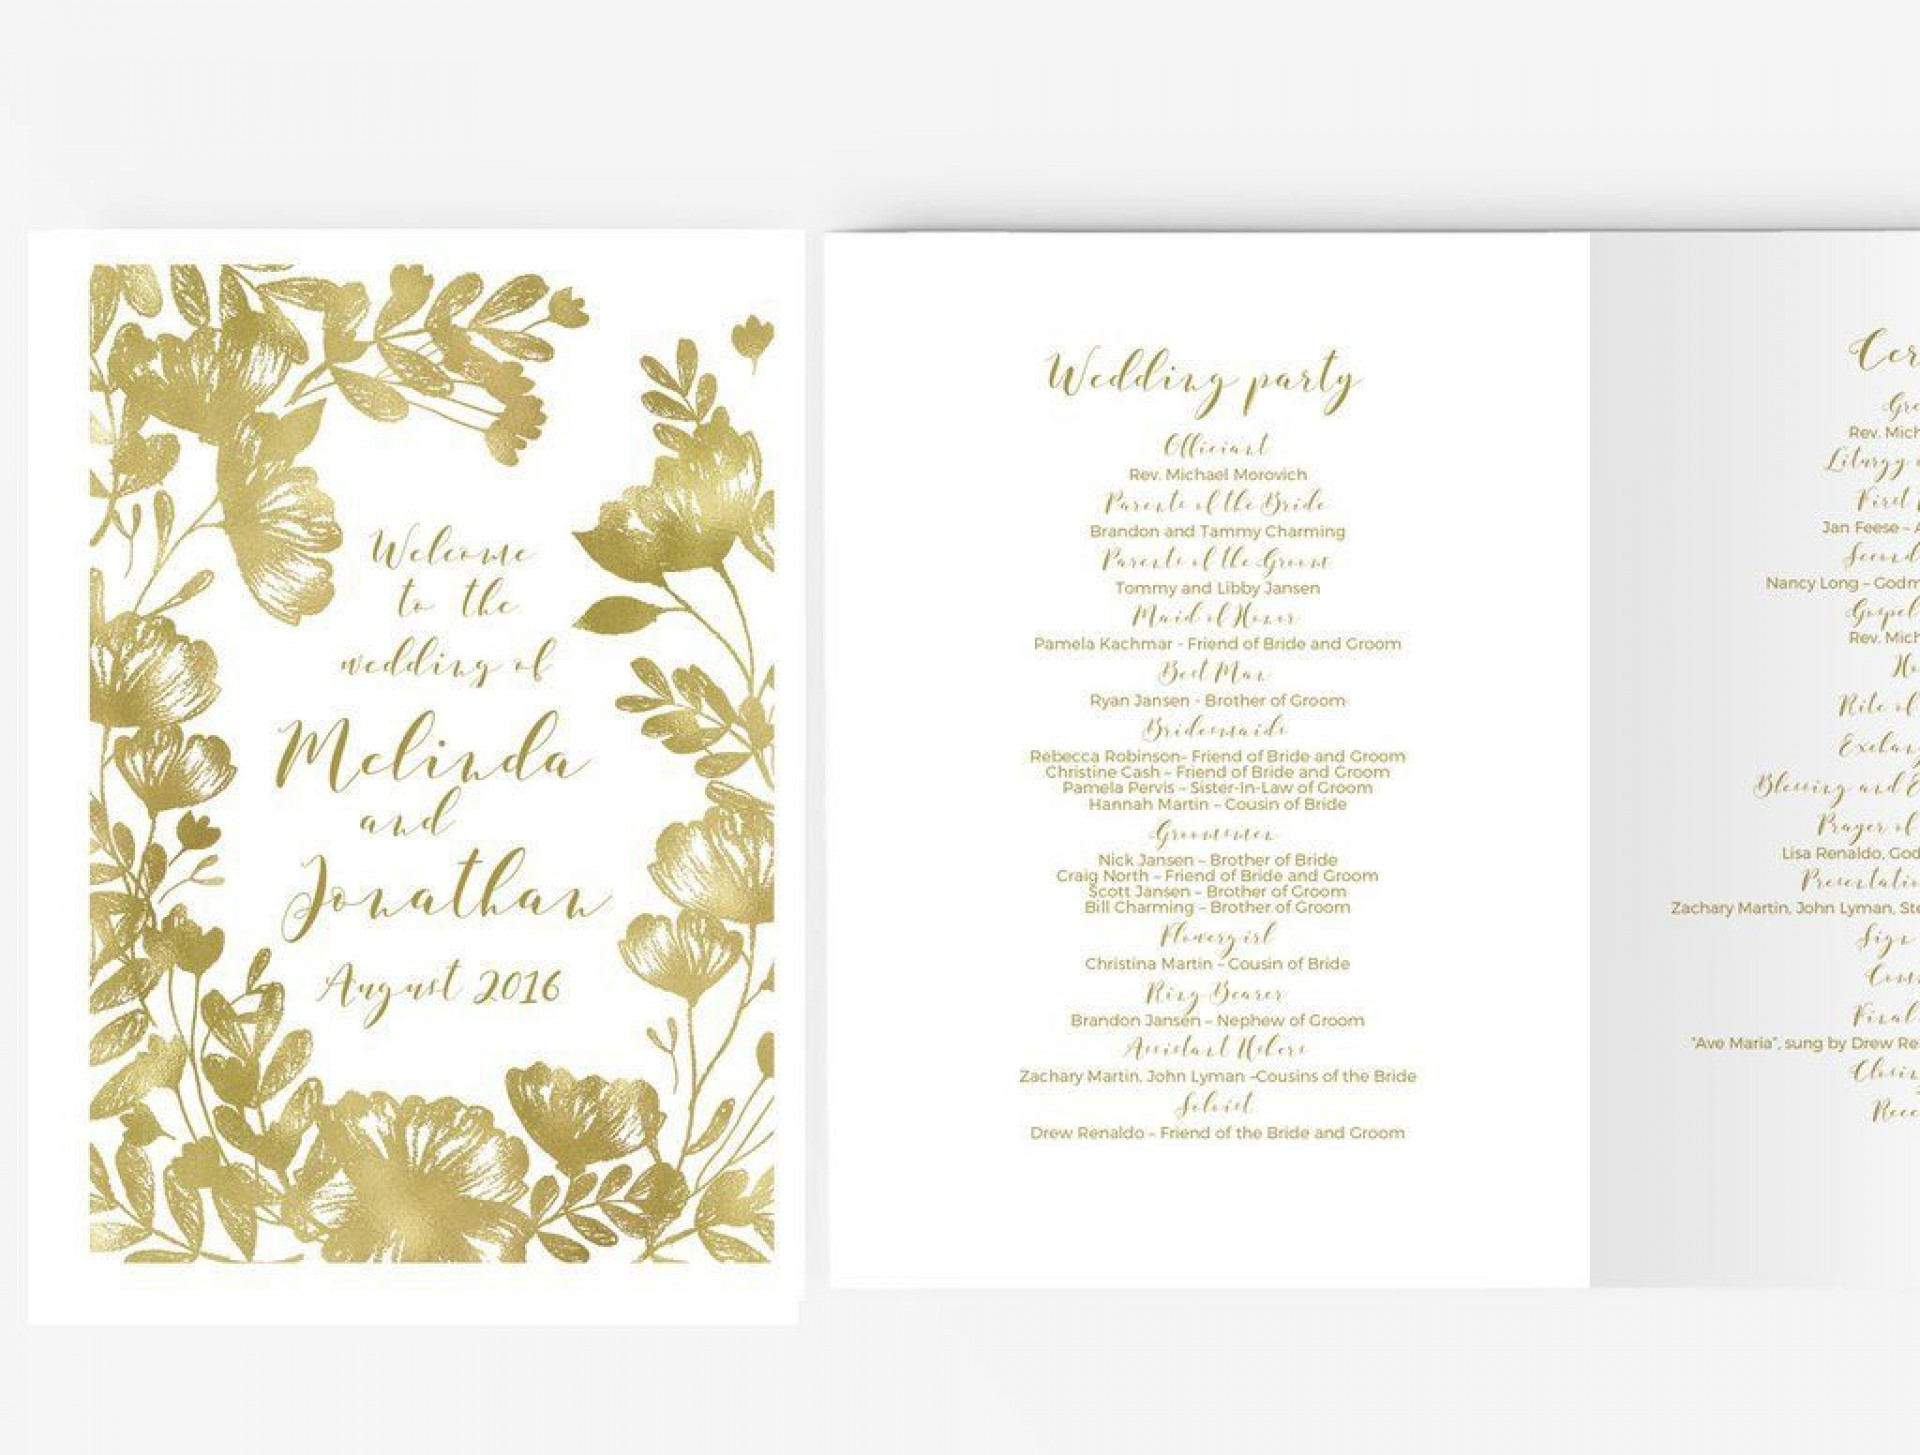 005 Astounding Wedding Program Template Word Sample  Catholic Mas Wording Idea Example Simple1920